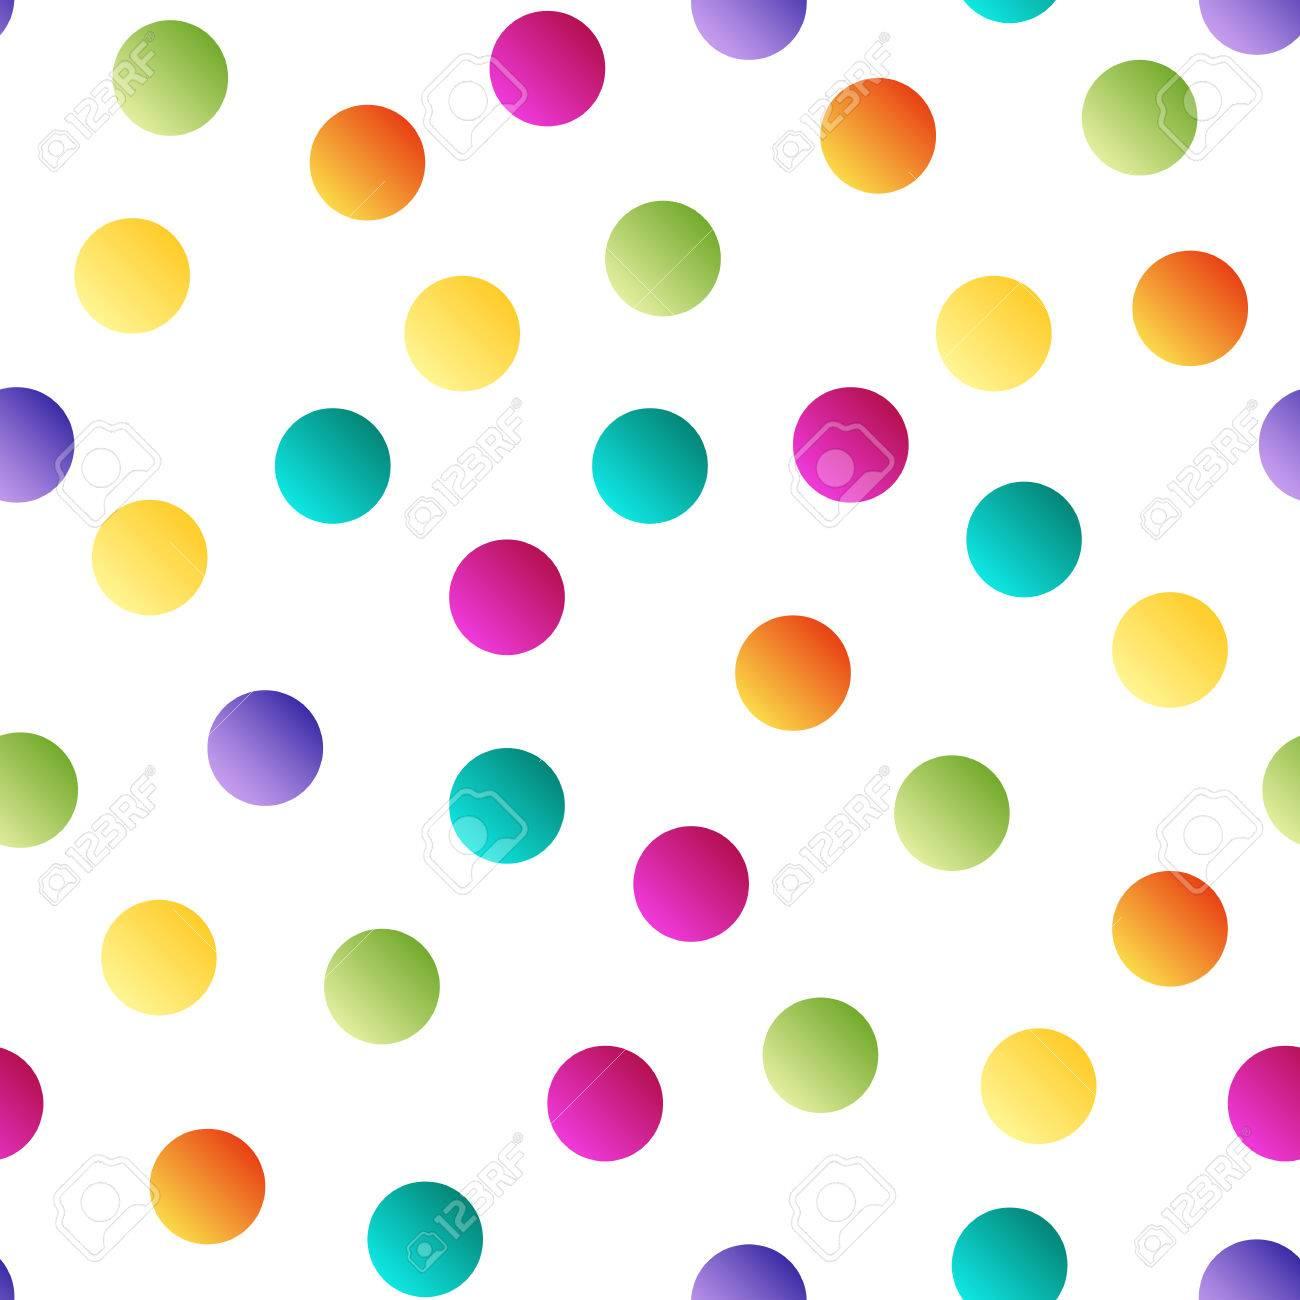 colorful bright polka dot seamless pattern on white background rh 123rf com black polka dot background clipart black polka dot background clipart